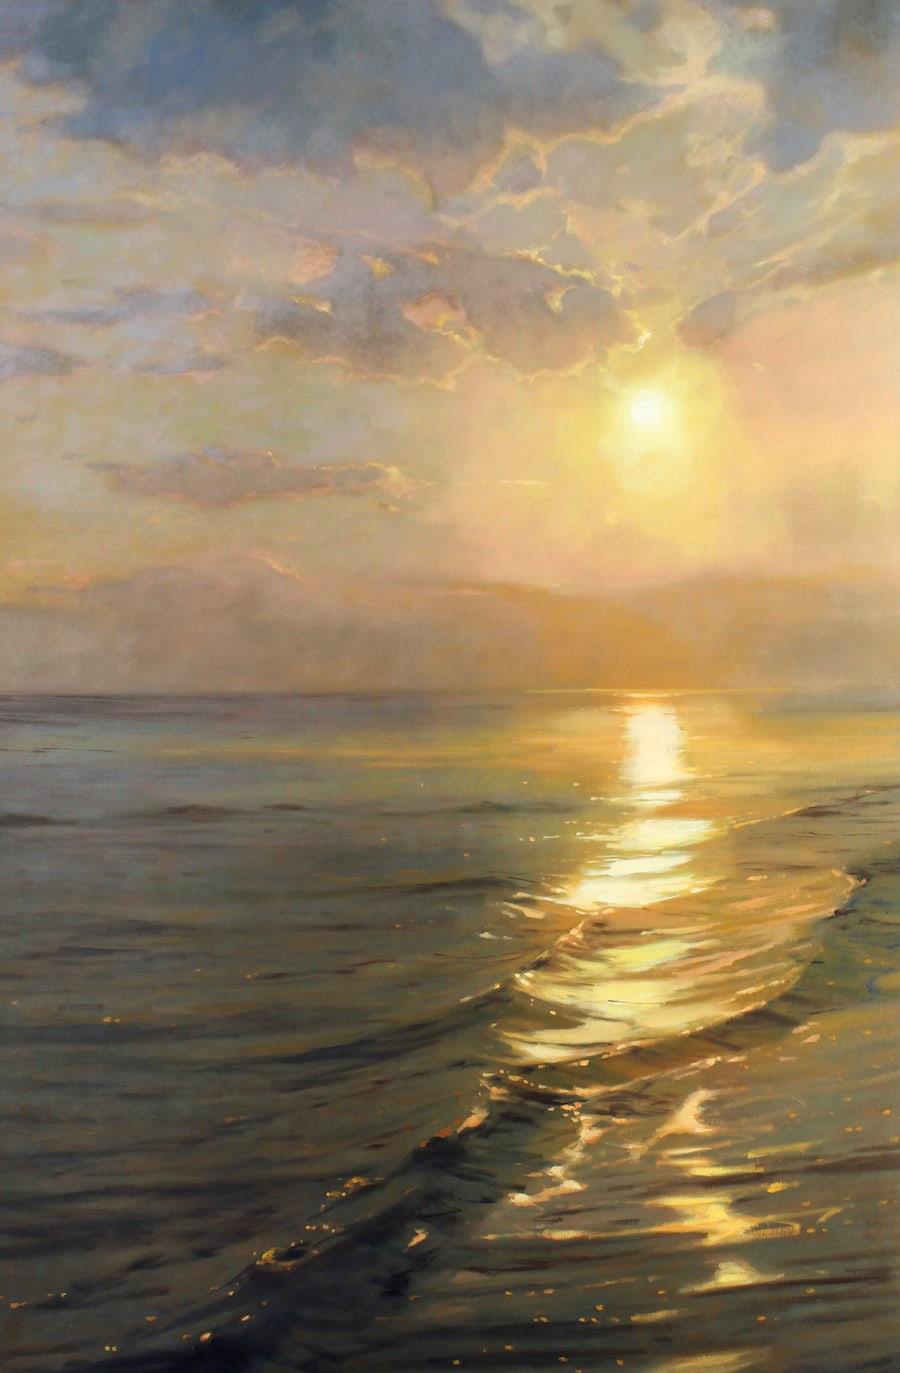 RICHARD JOHNSON ARTIST - Morning Reflections